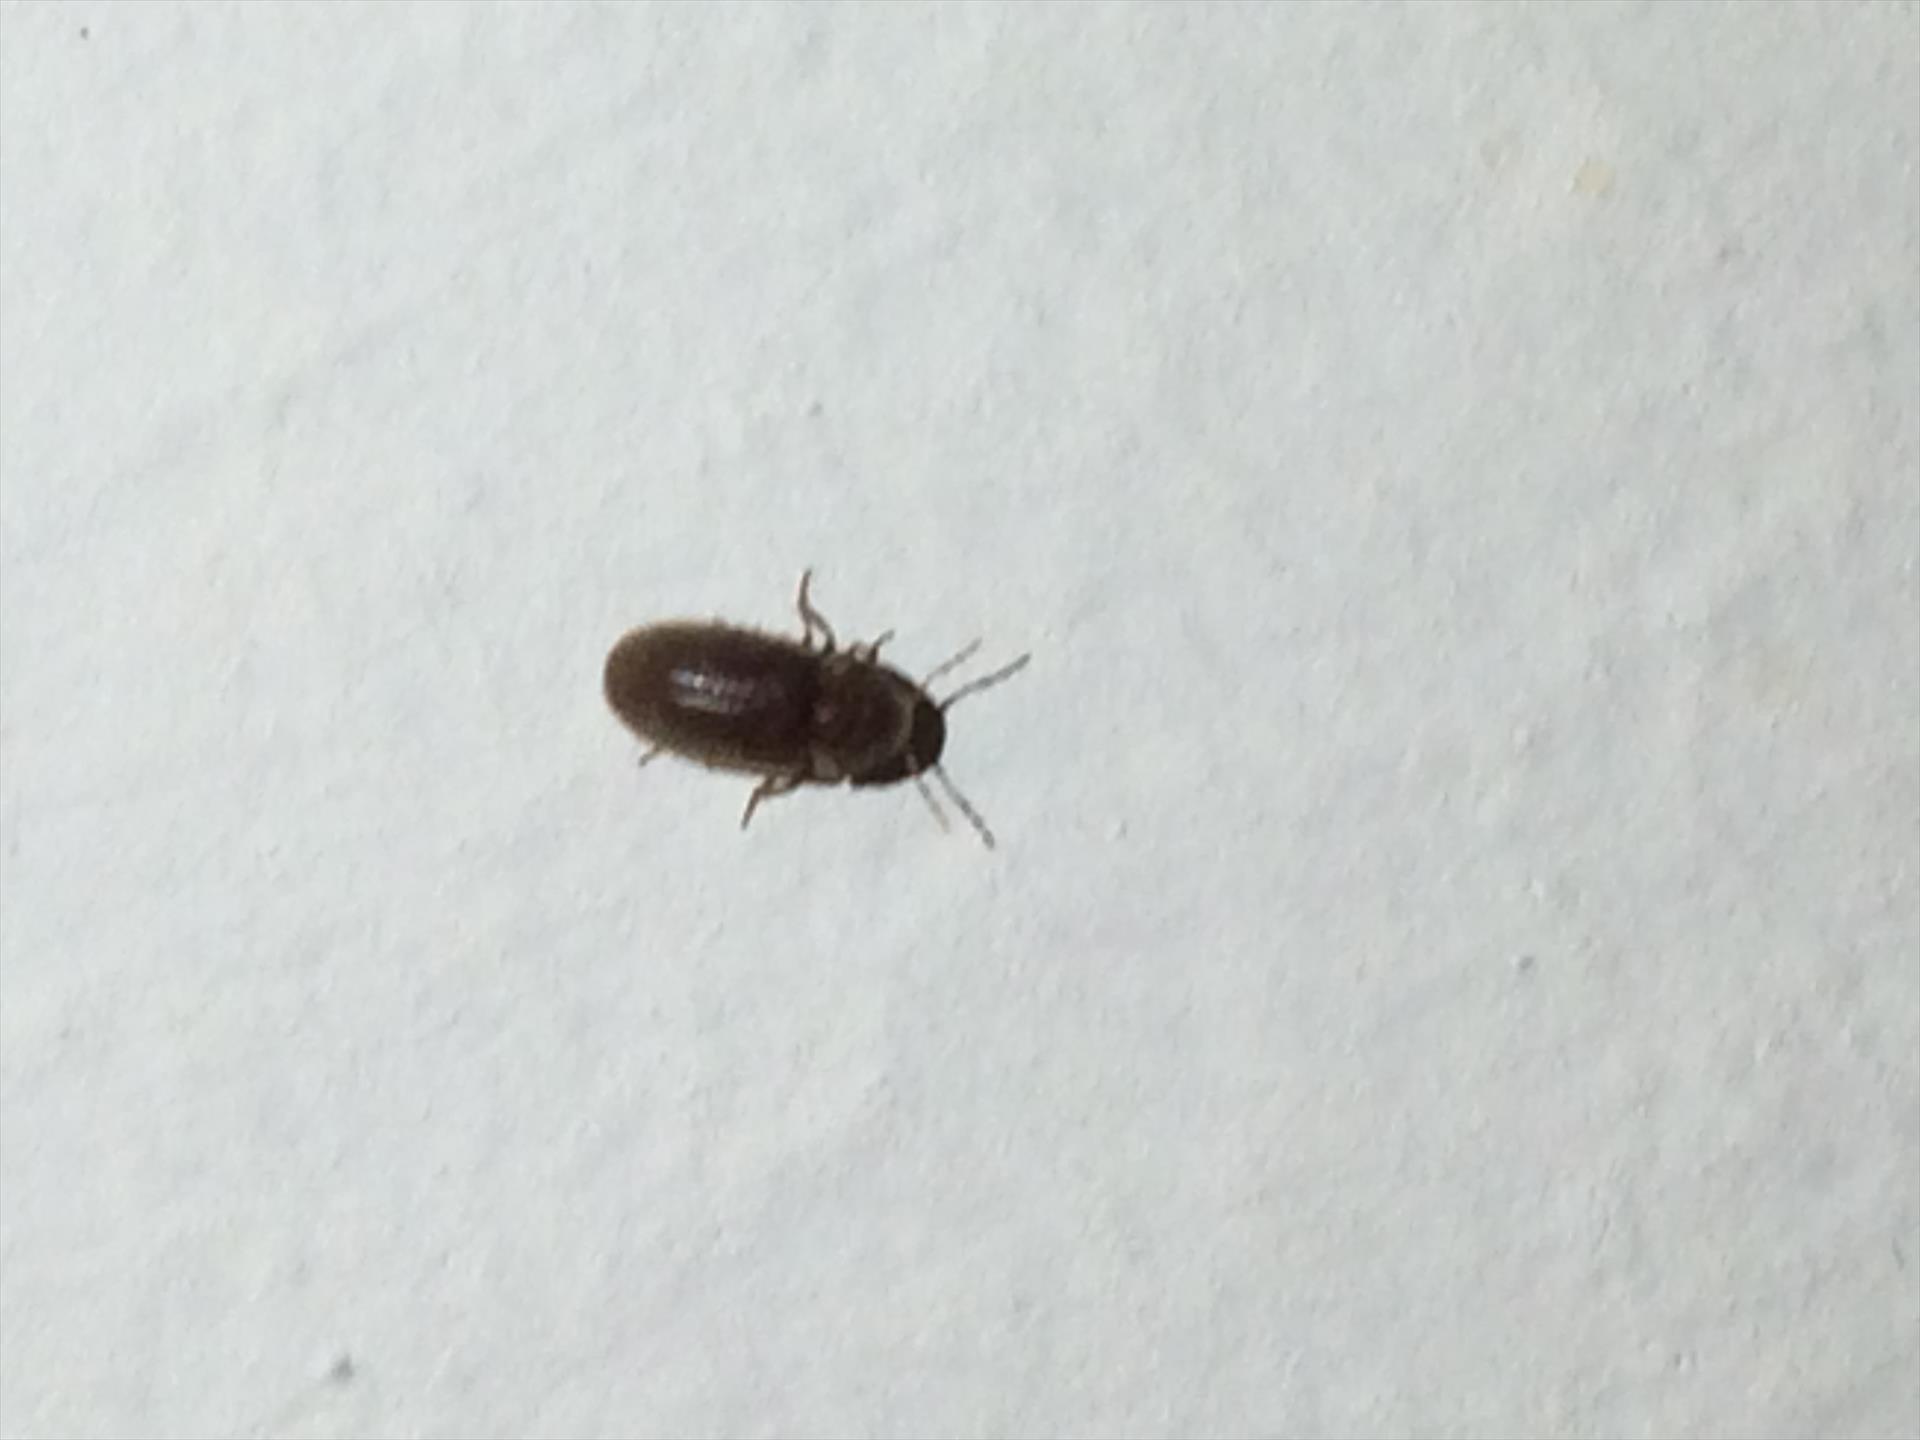 Insetti in casa neri 28 images insettini lunghi neri pestforum insetti neri con corazza - Invasione di formiche in cucina ...